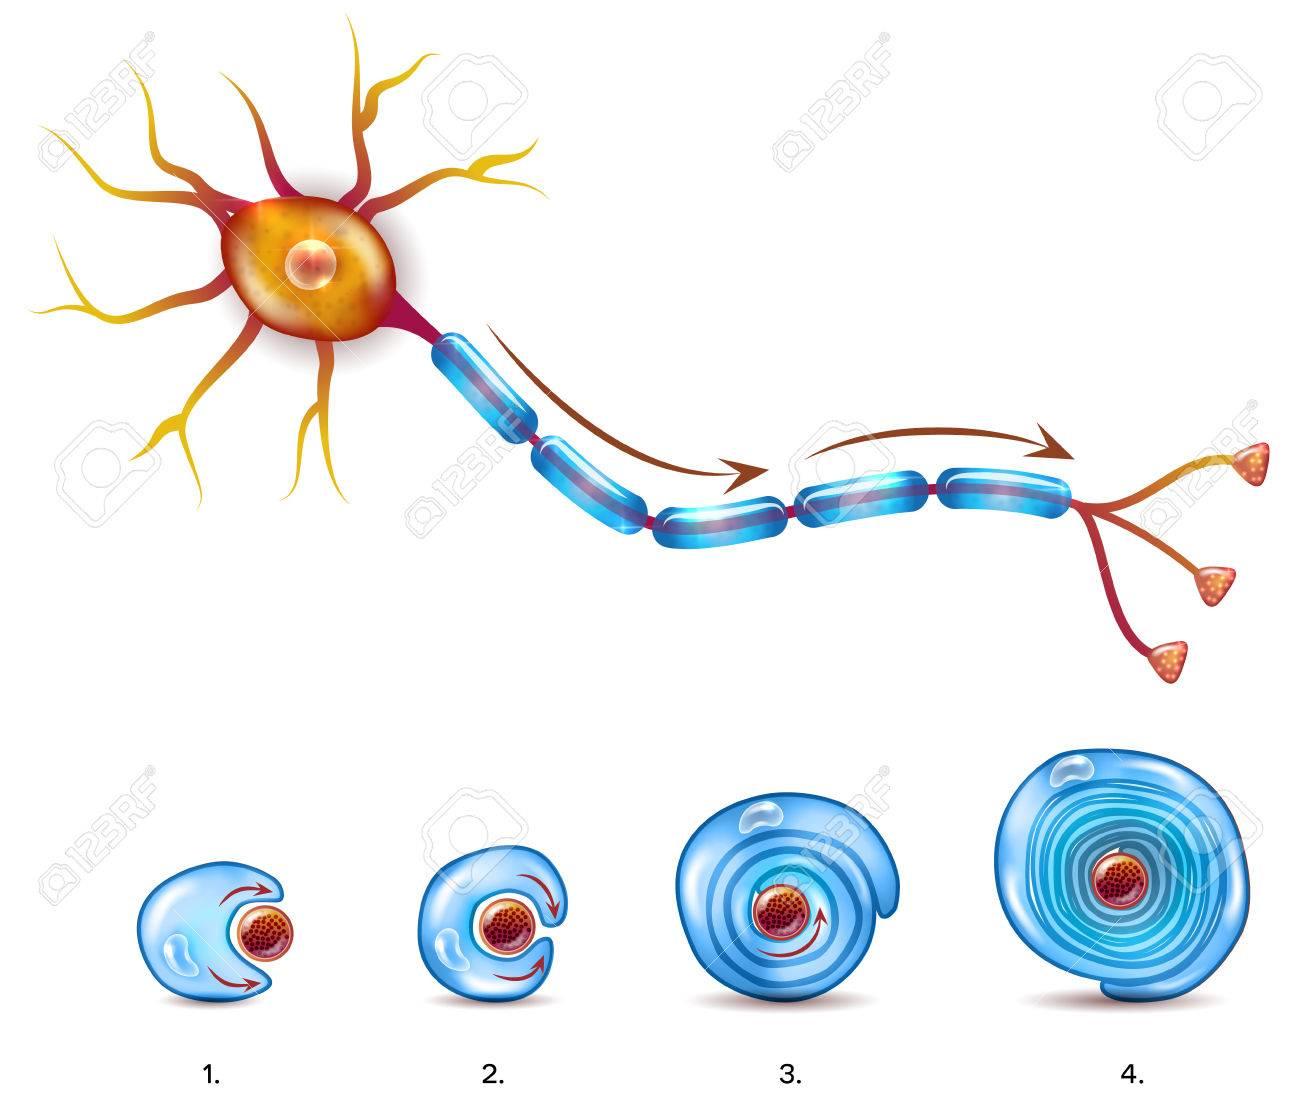 Neuron Anatomy And Myelin Sheath Formation Around Axon Royalty Free ...